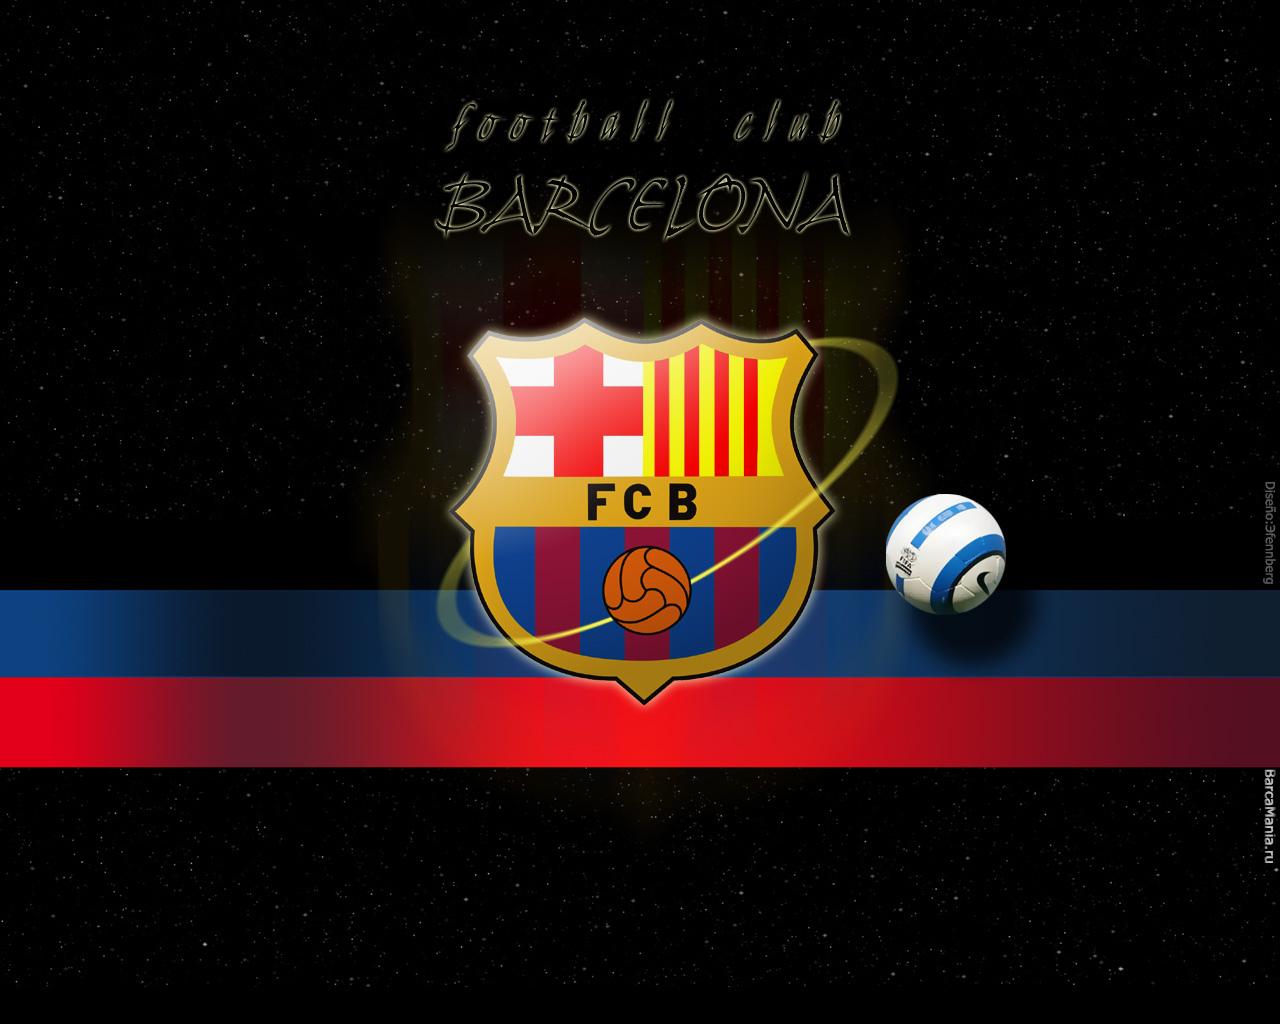 Football Clubs: Best Celebrity: Barcelona Football Club